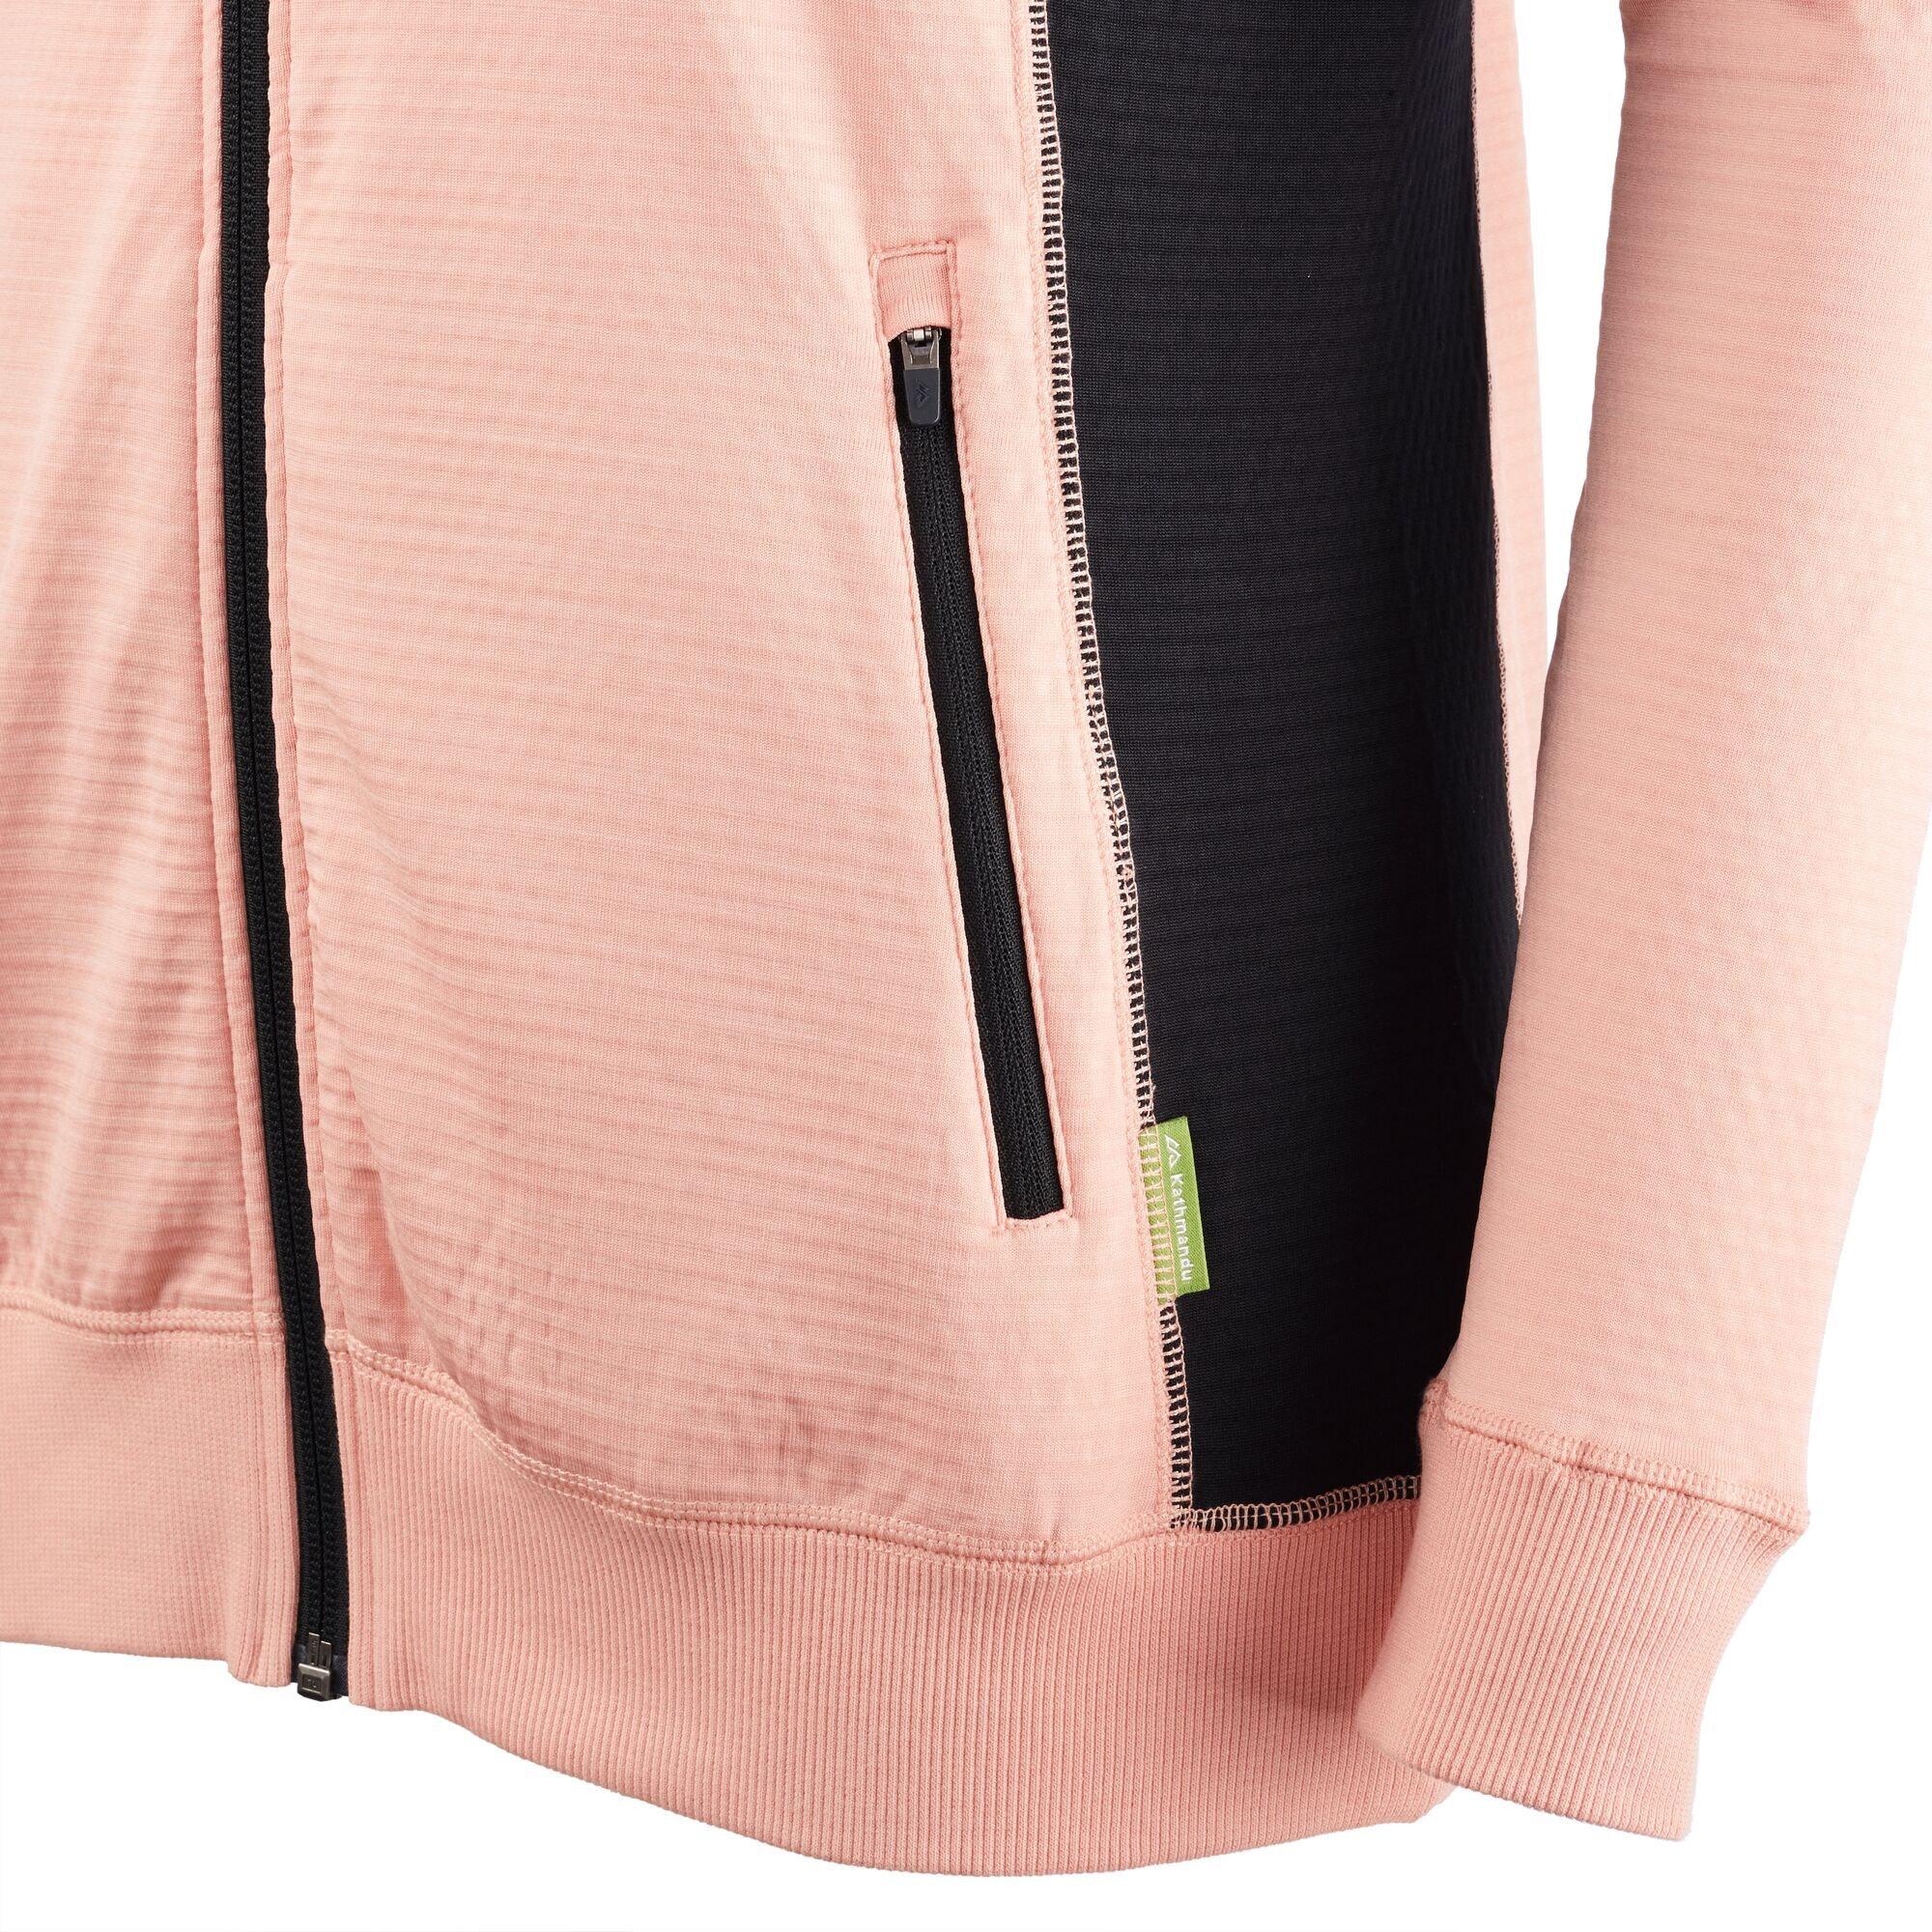 NEW-Kathmandu-Acota-Women-s-Hooded-Fleece-Lightweight-Breathable-Outdoor-Jacket thumbnail 34